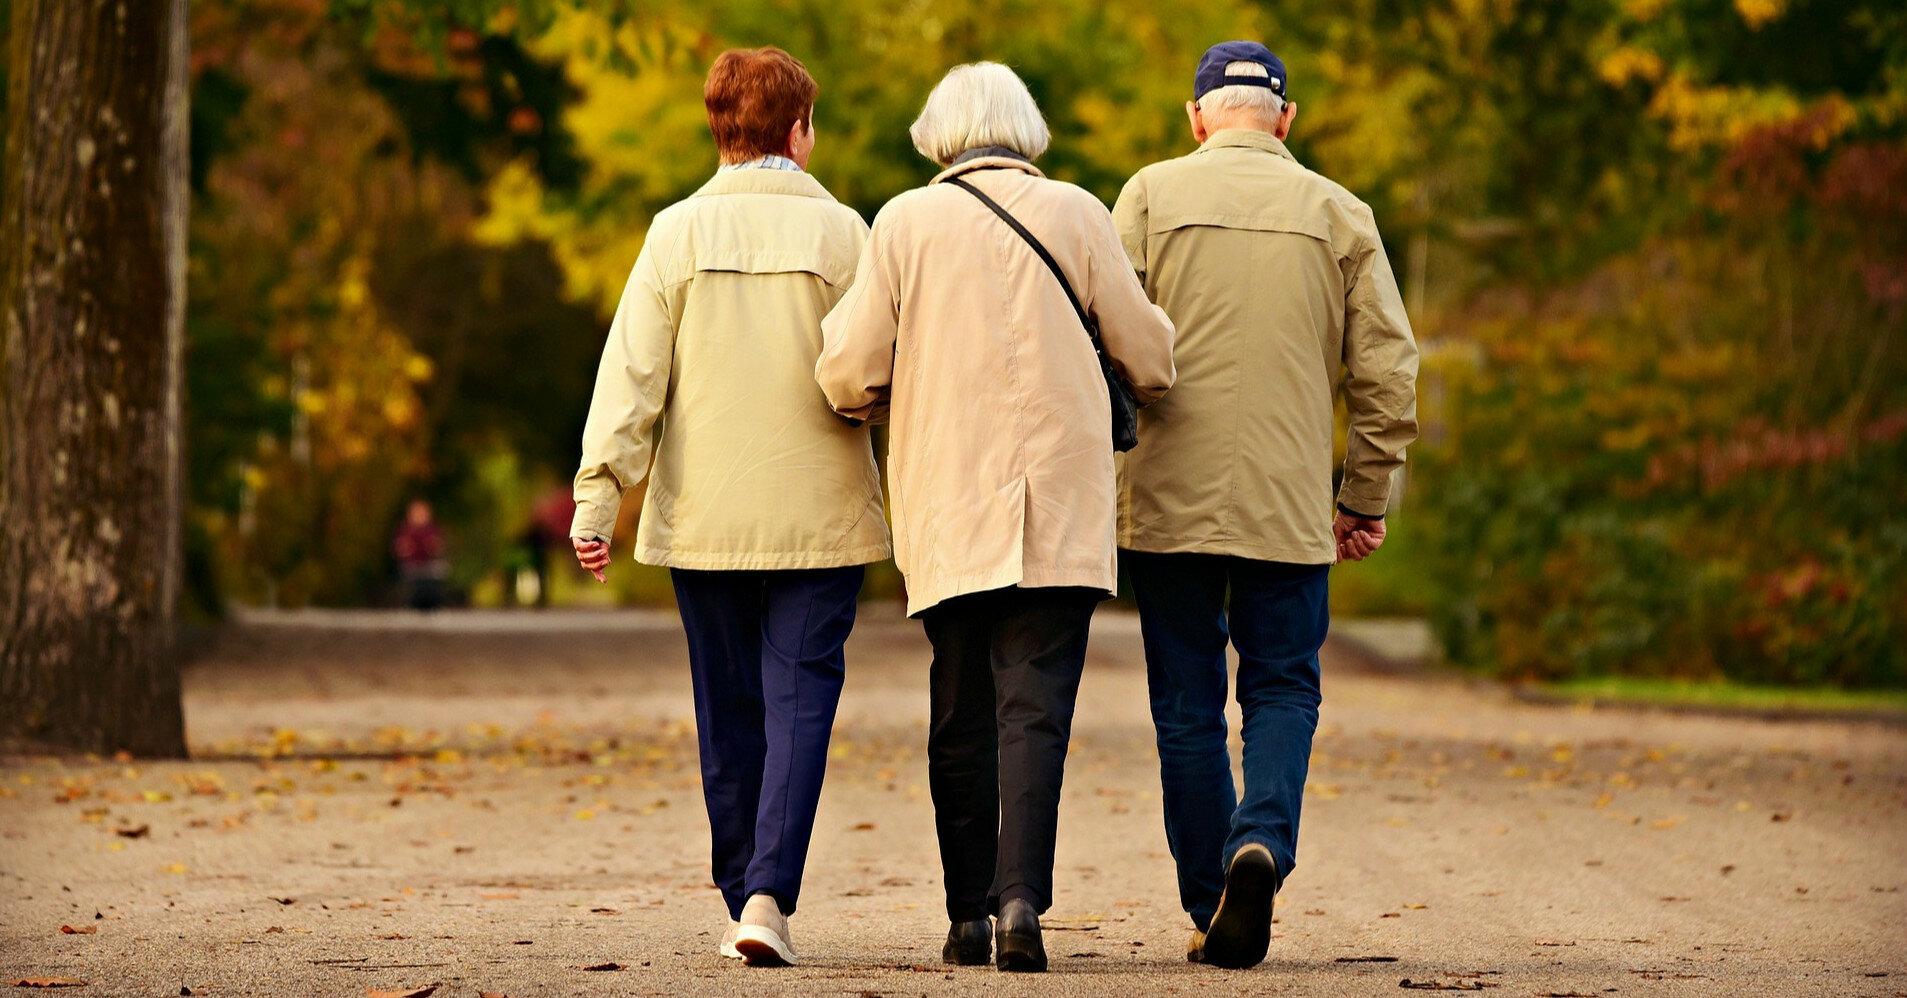 Полмиллиона украинцев могут остаться без пенсий – Минсоцполитики